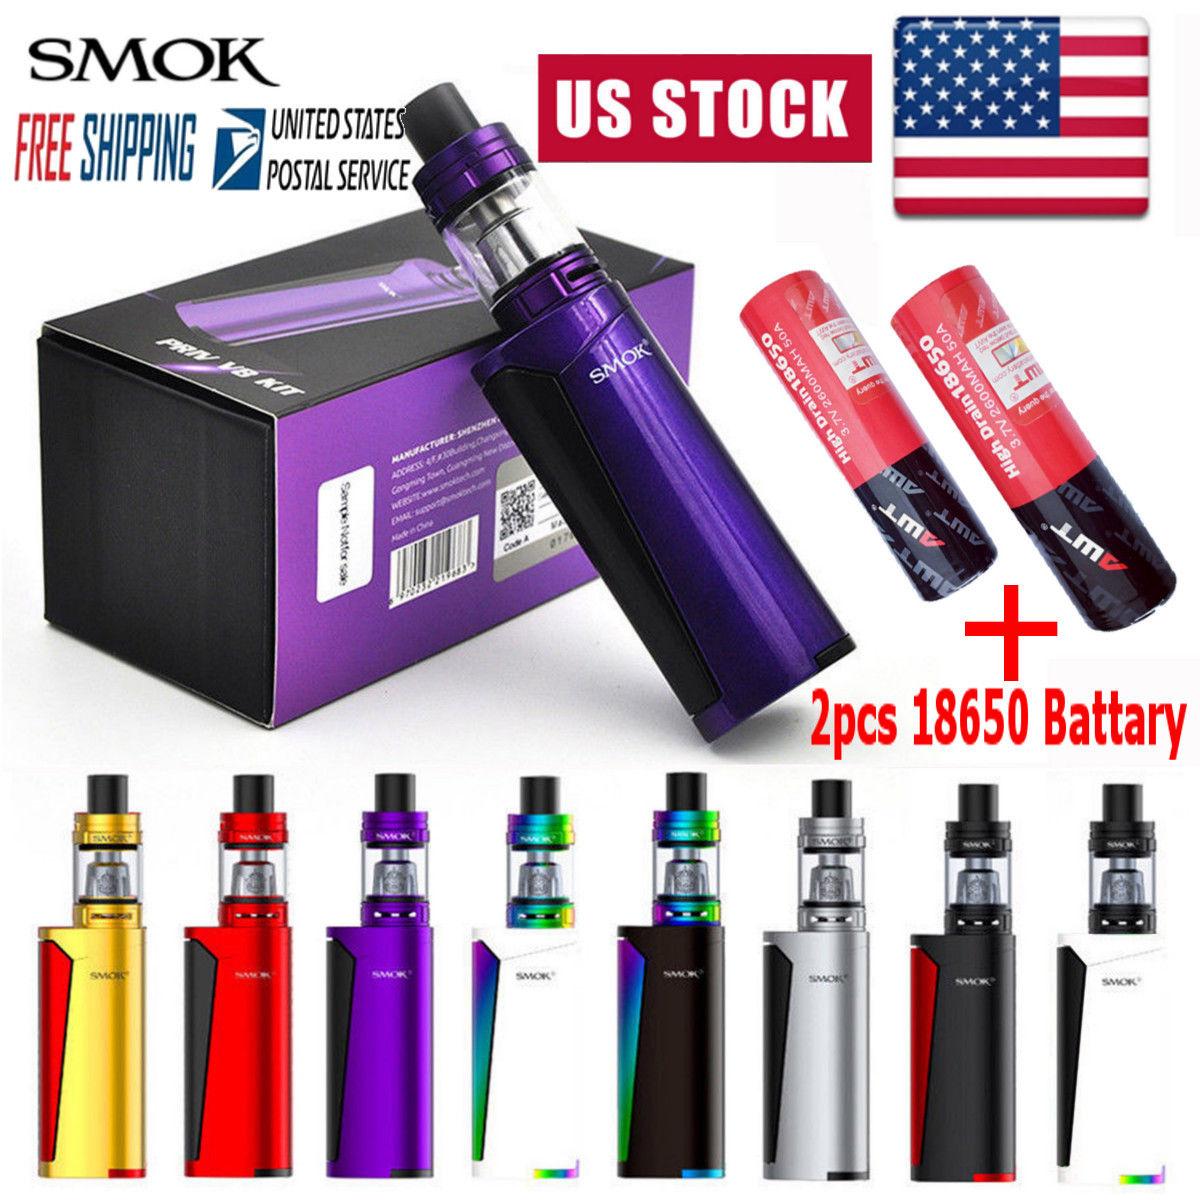 Smok1 60W PRIV V8 Starter Full Vape1 Kit Mod with TFV8 Tank & 2PCS Battery